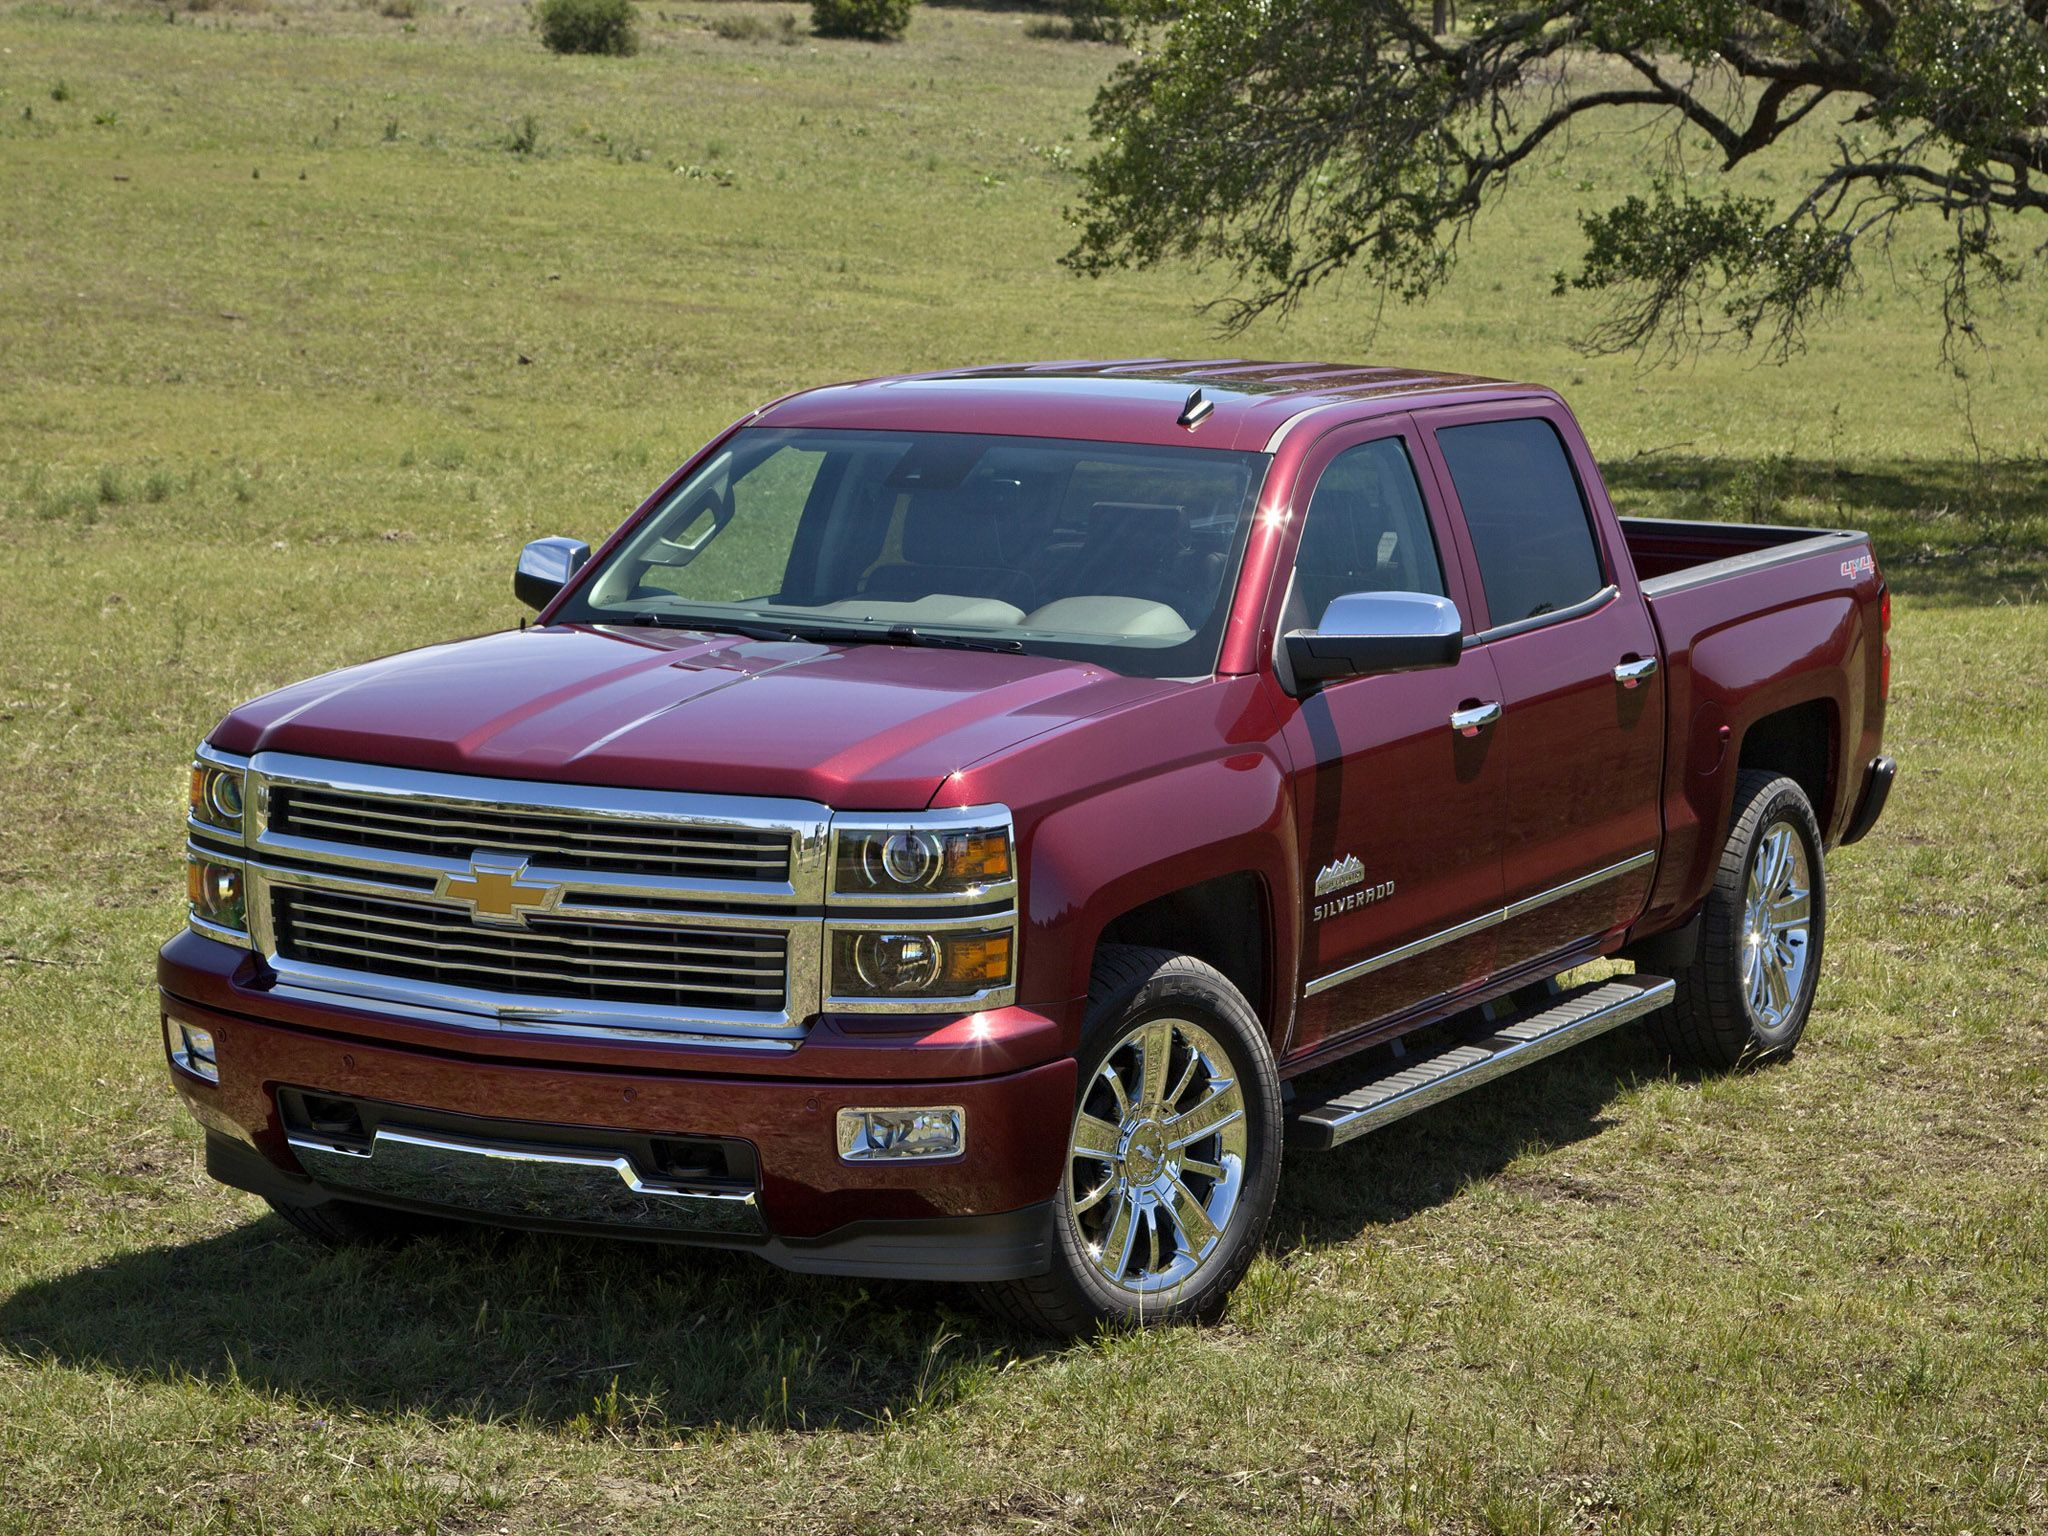 Best 25 Silverado Truck Ideas On Pinterest New Chevy Silverado